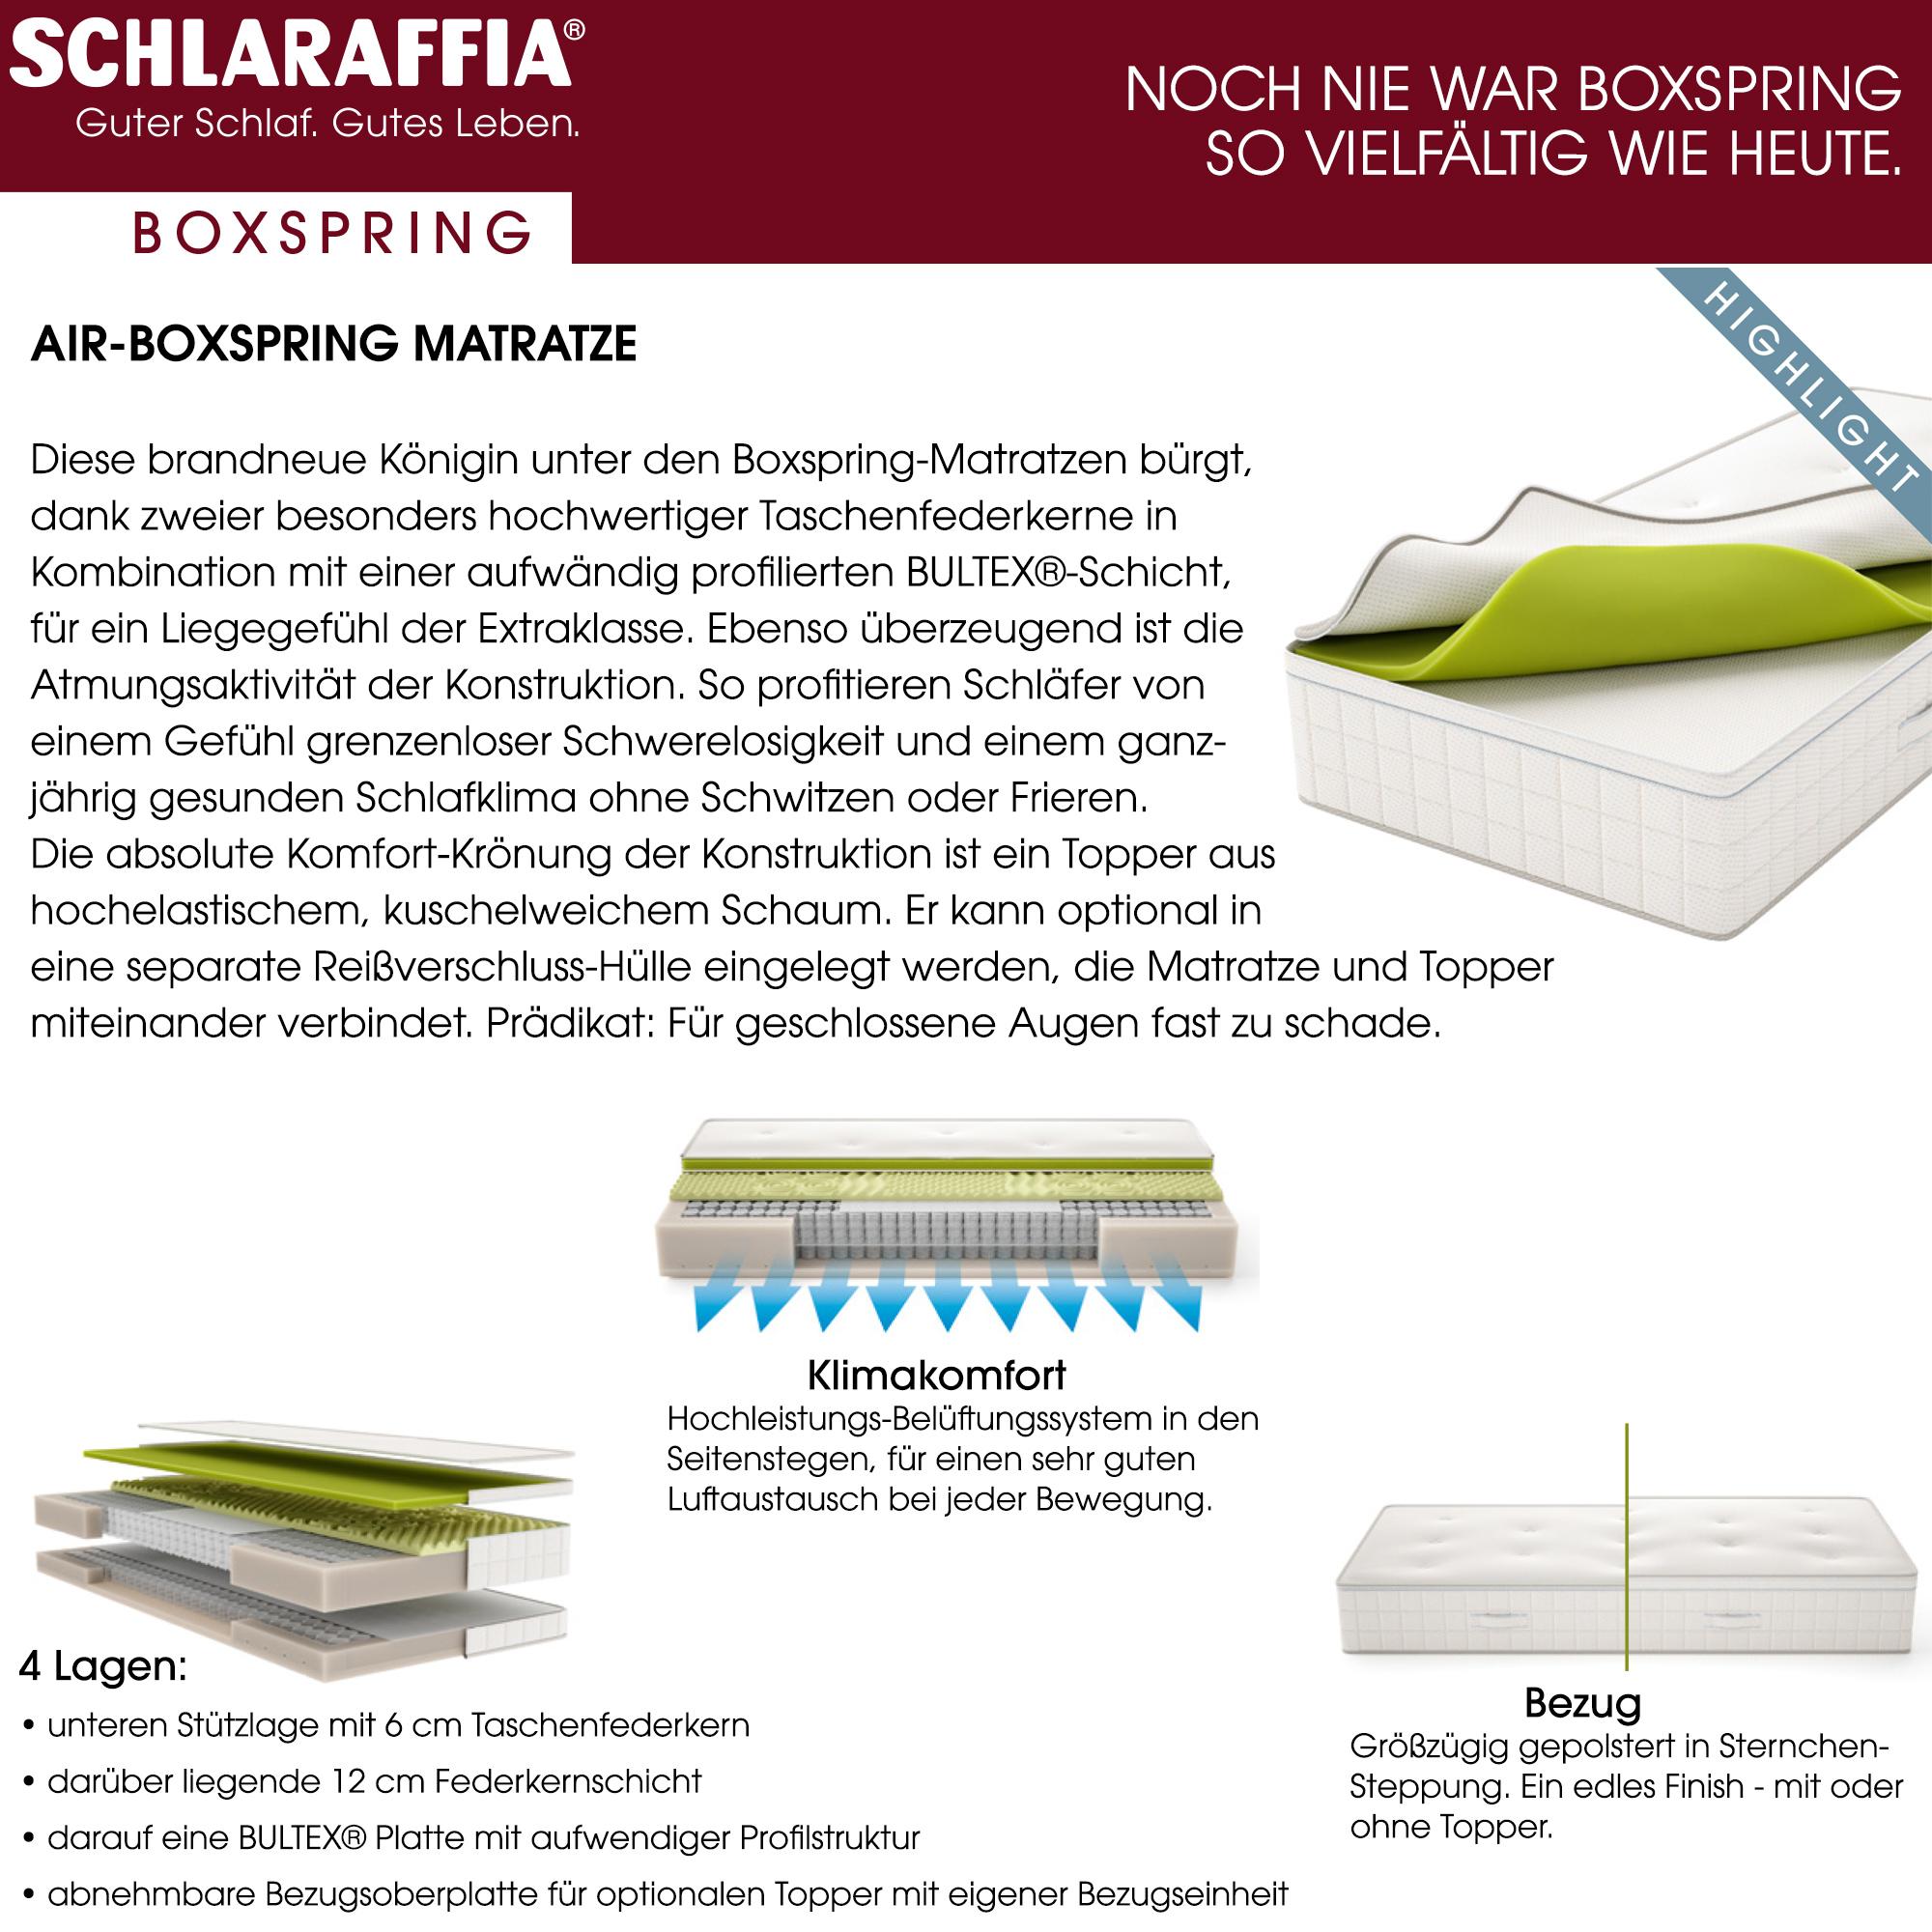 Boxspringbett_Schlaraffia